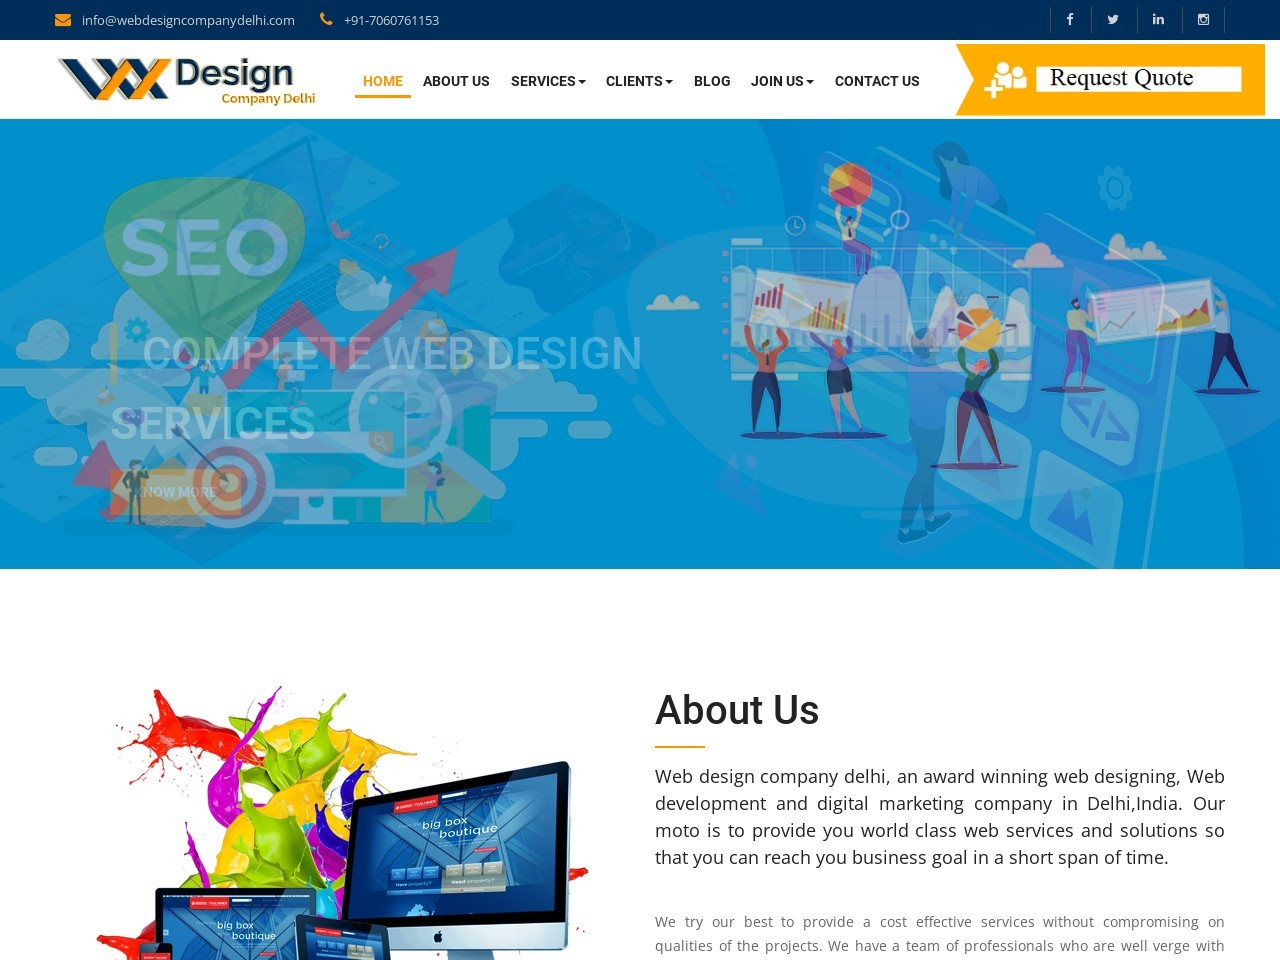 Web design company near me